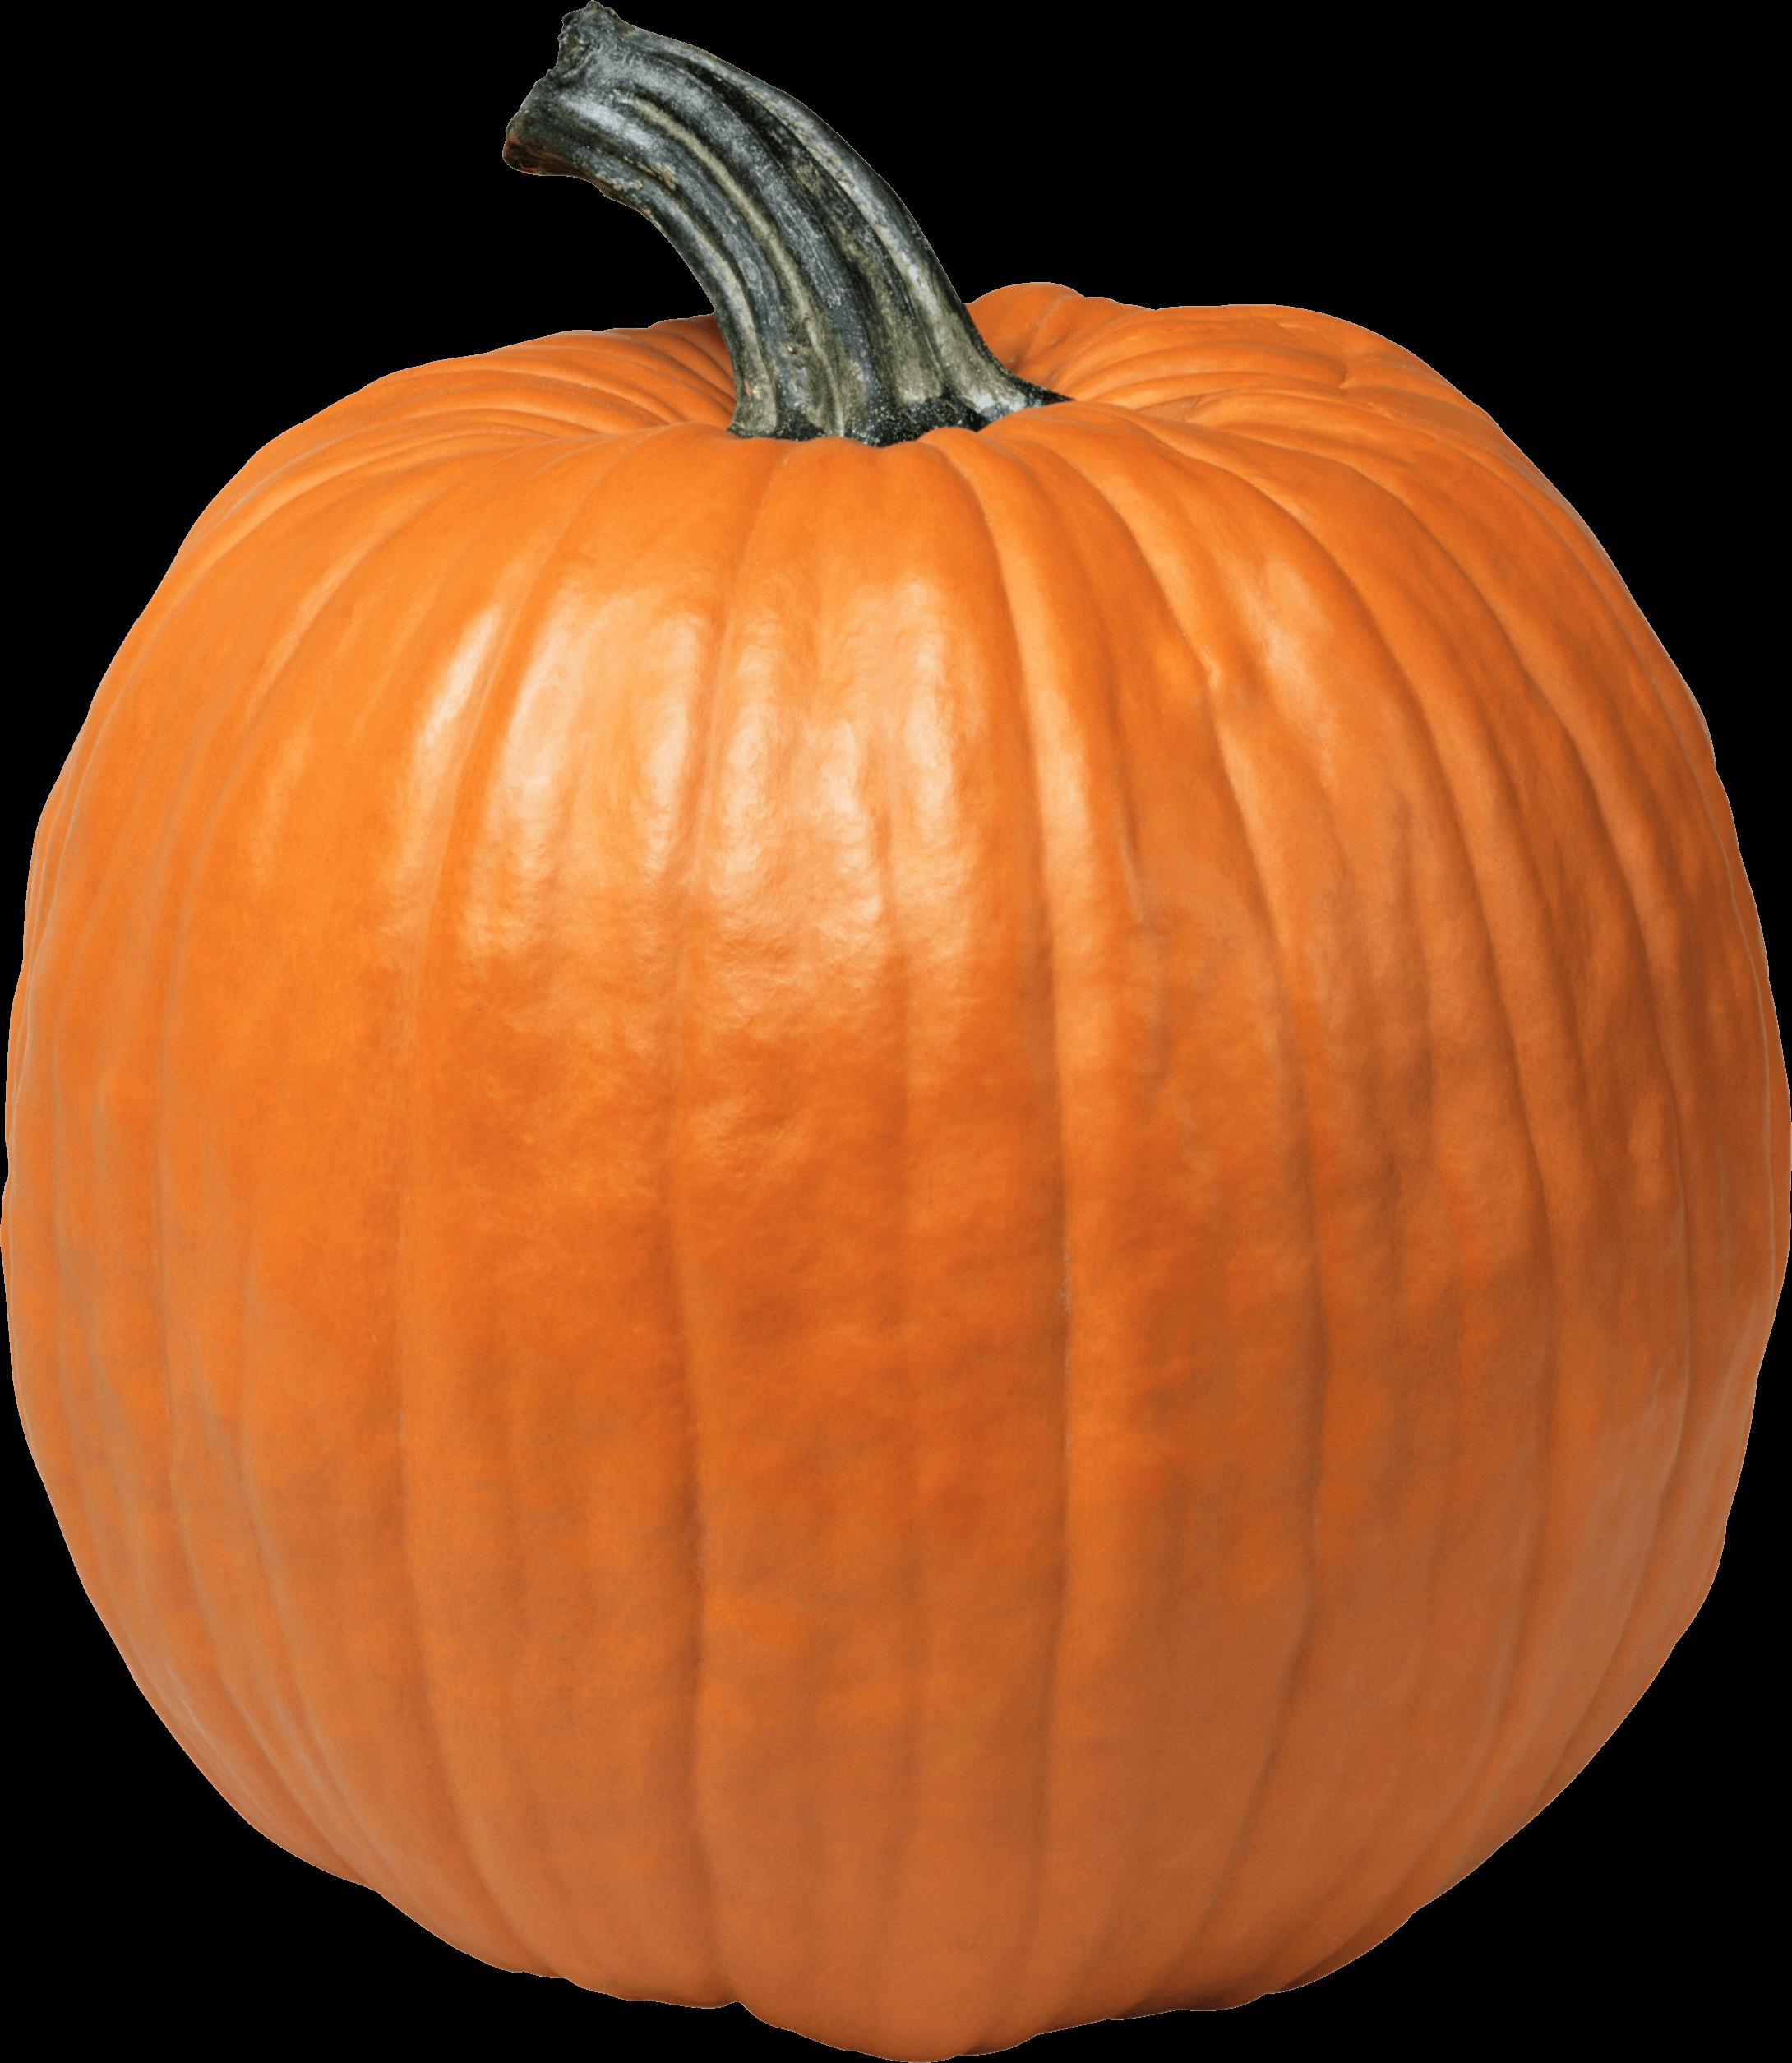 Single pumpkin clipart picture freeuse download Pumpkins transparent PNG images - StickPNG picture freeuse download